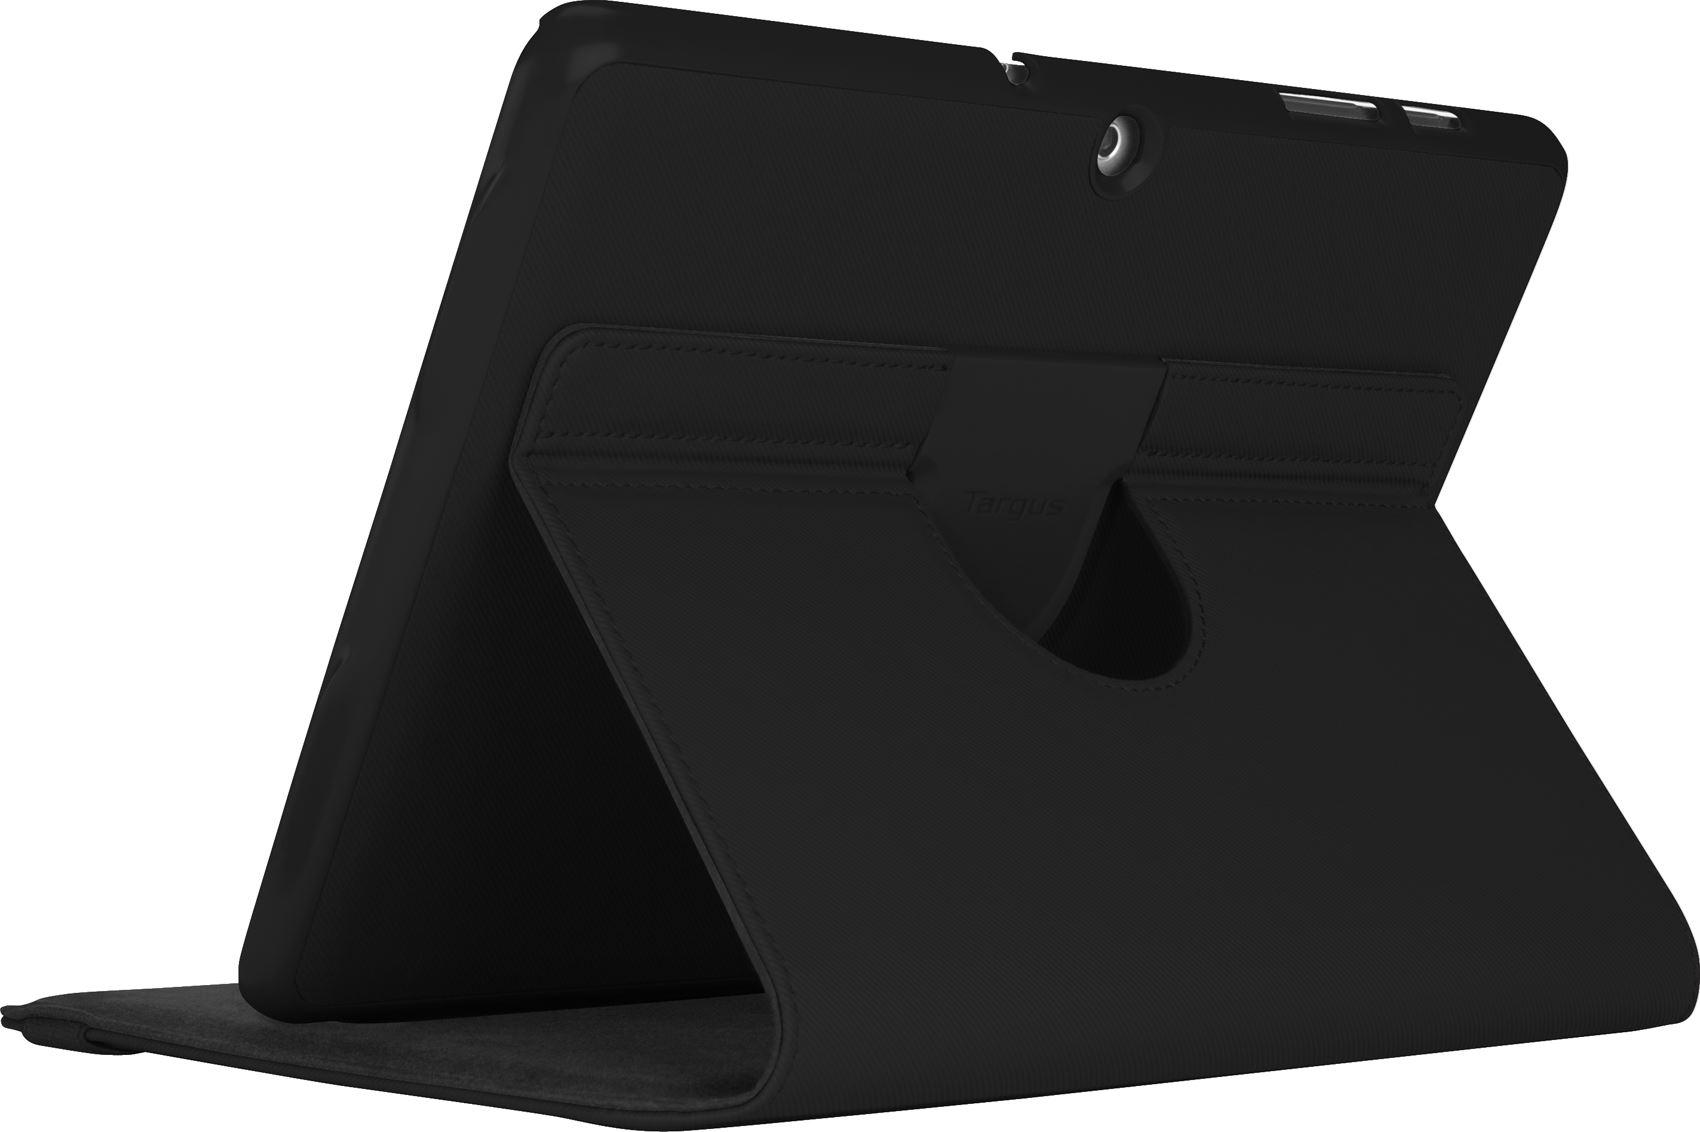 Picture of Targus Versavu™ Case for Samsung Galaxy Tab 3 10.1 (black)